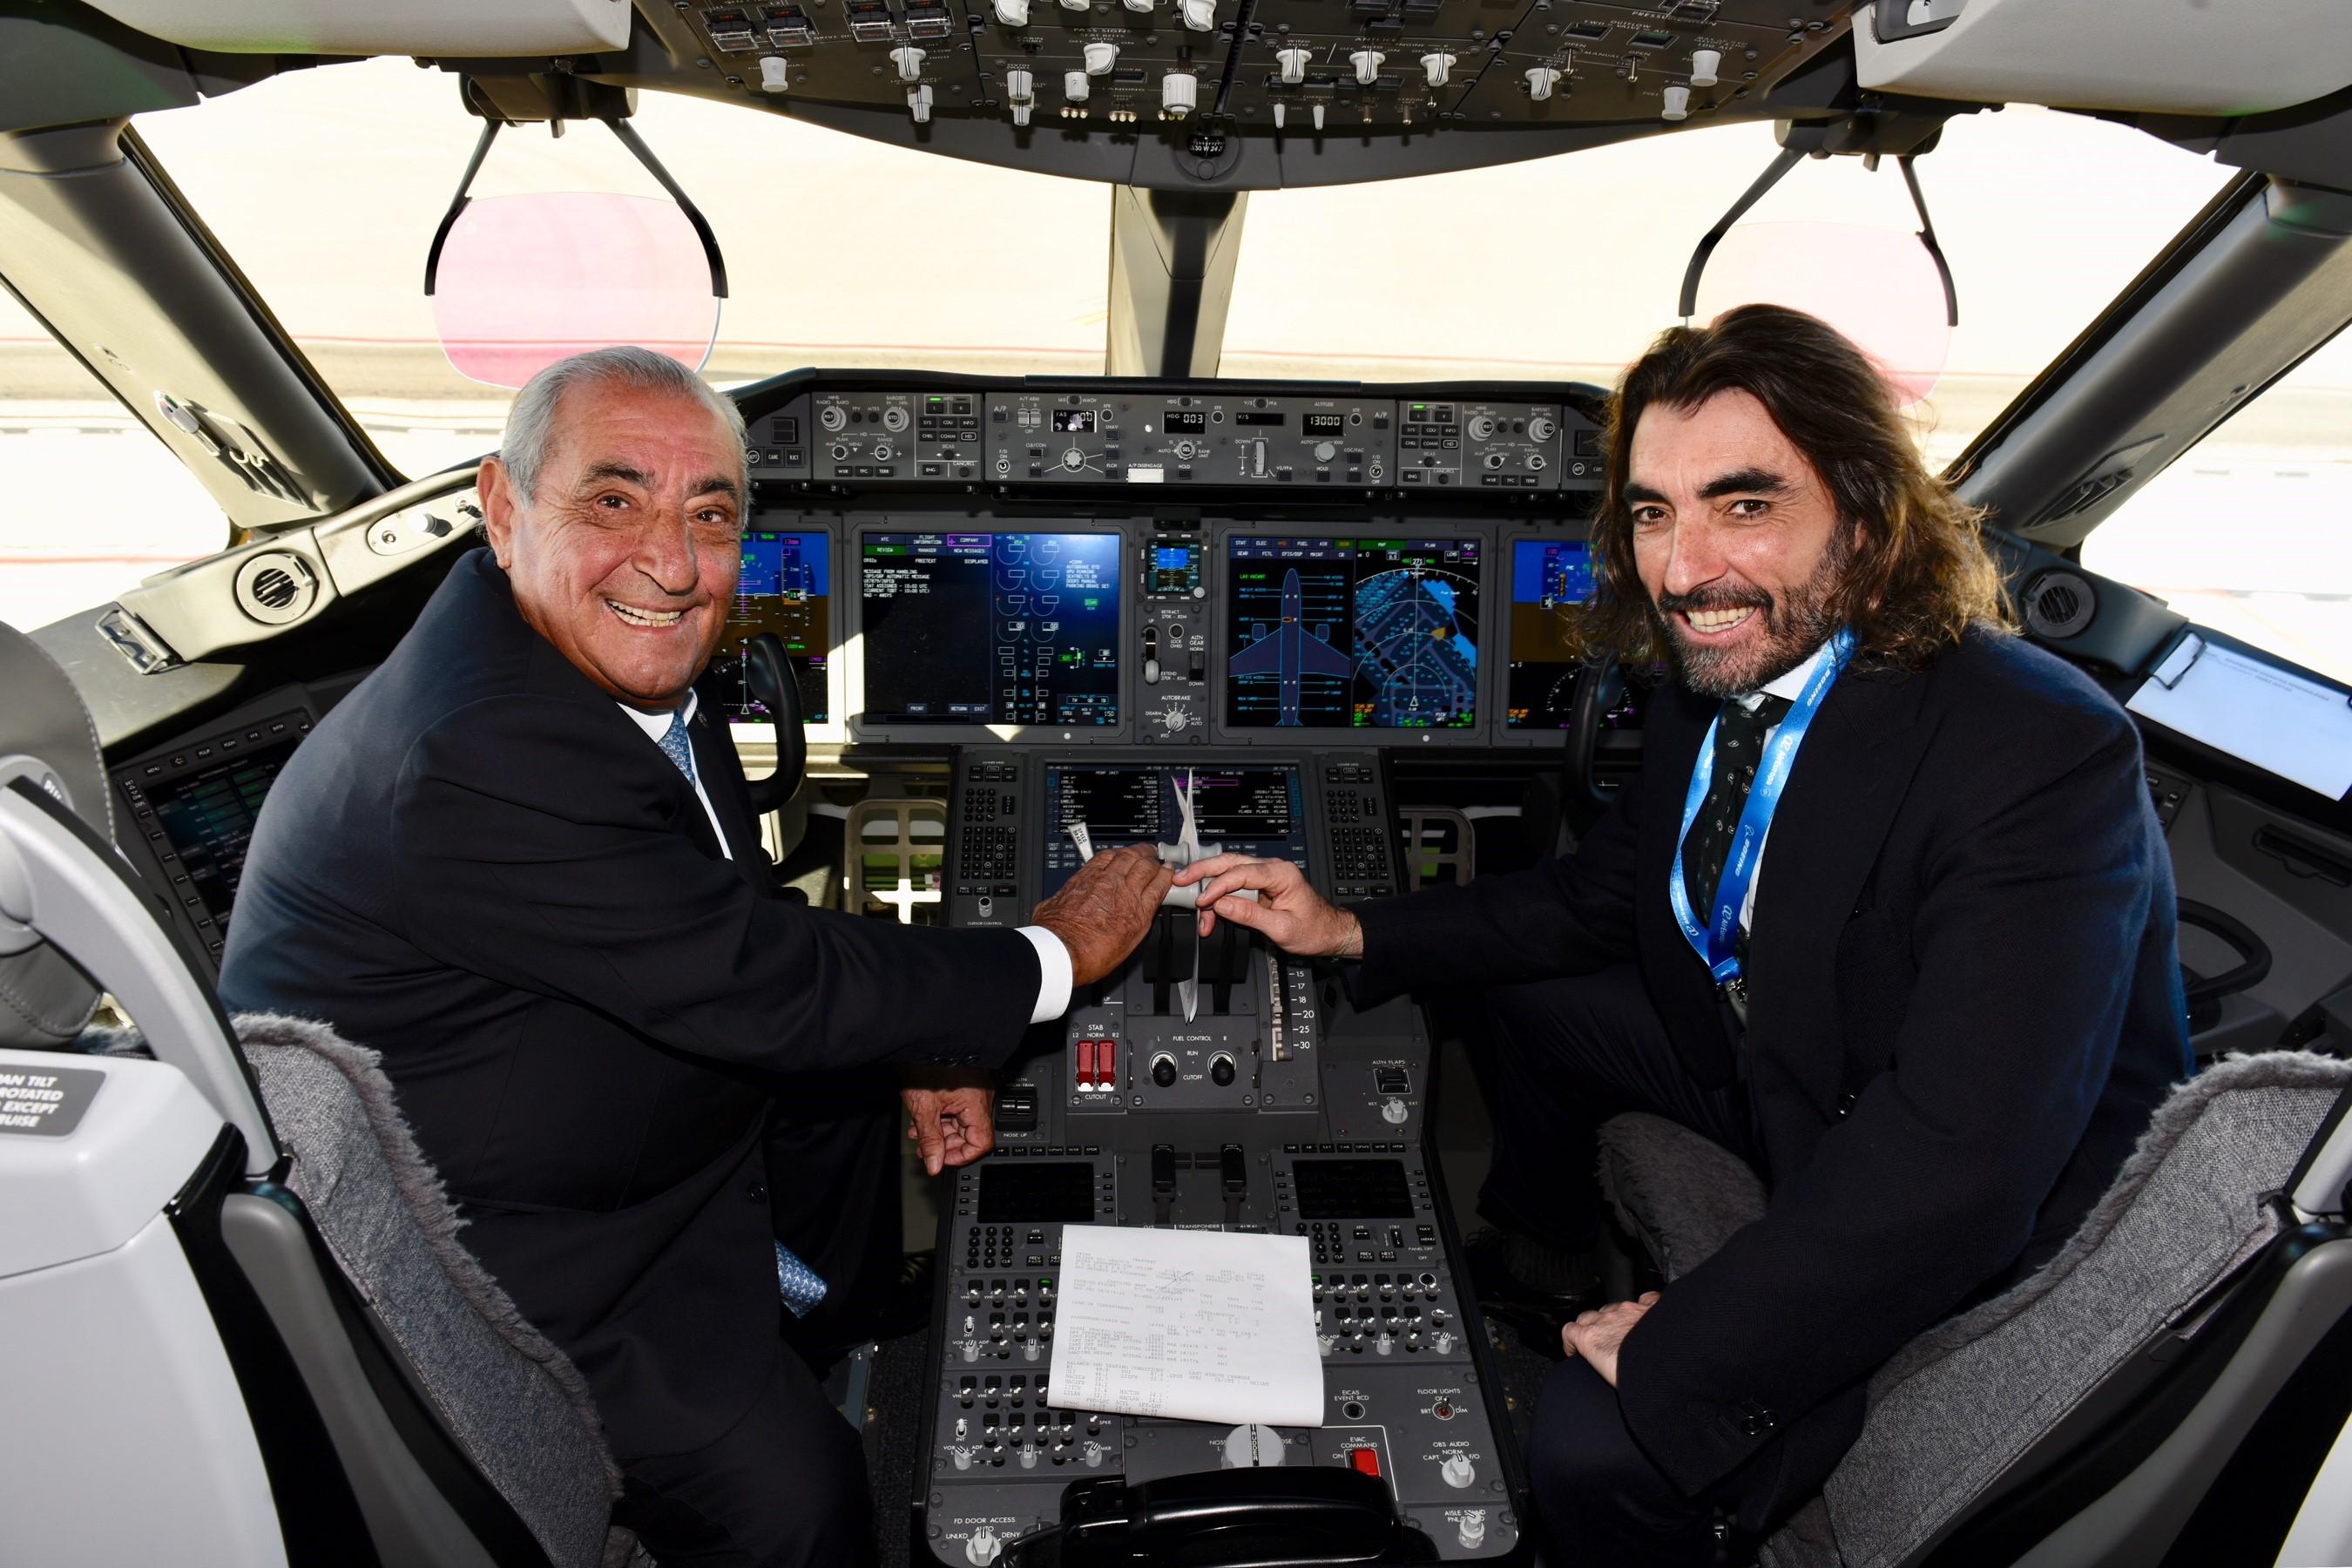 juan jose hidalgo, presidente globalia, air europa, dreamliner, 787, boeing